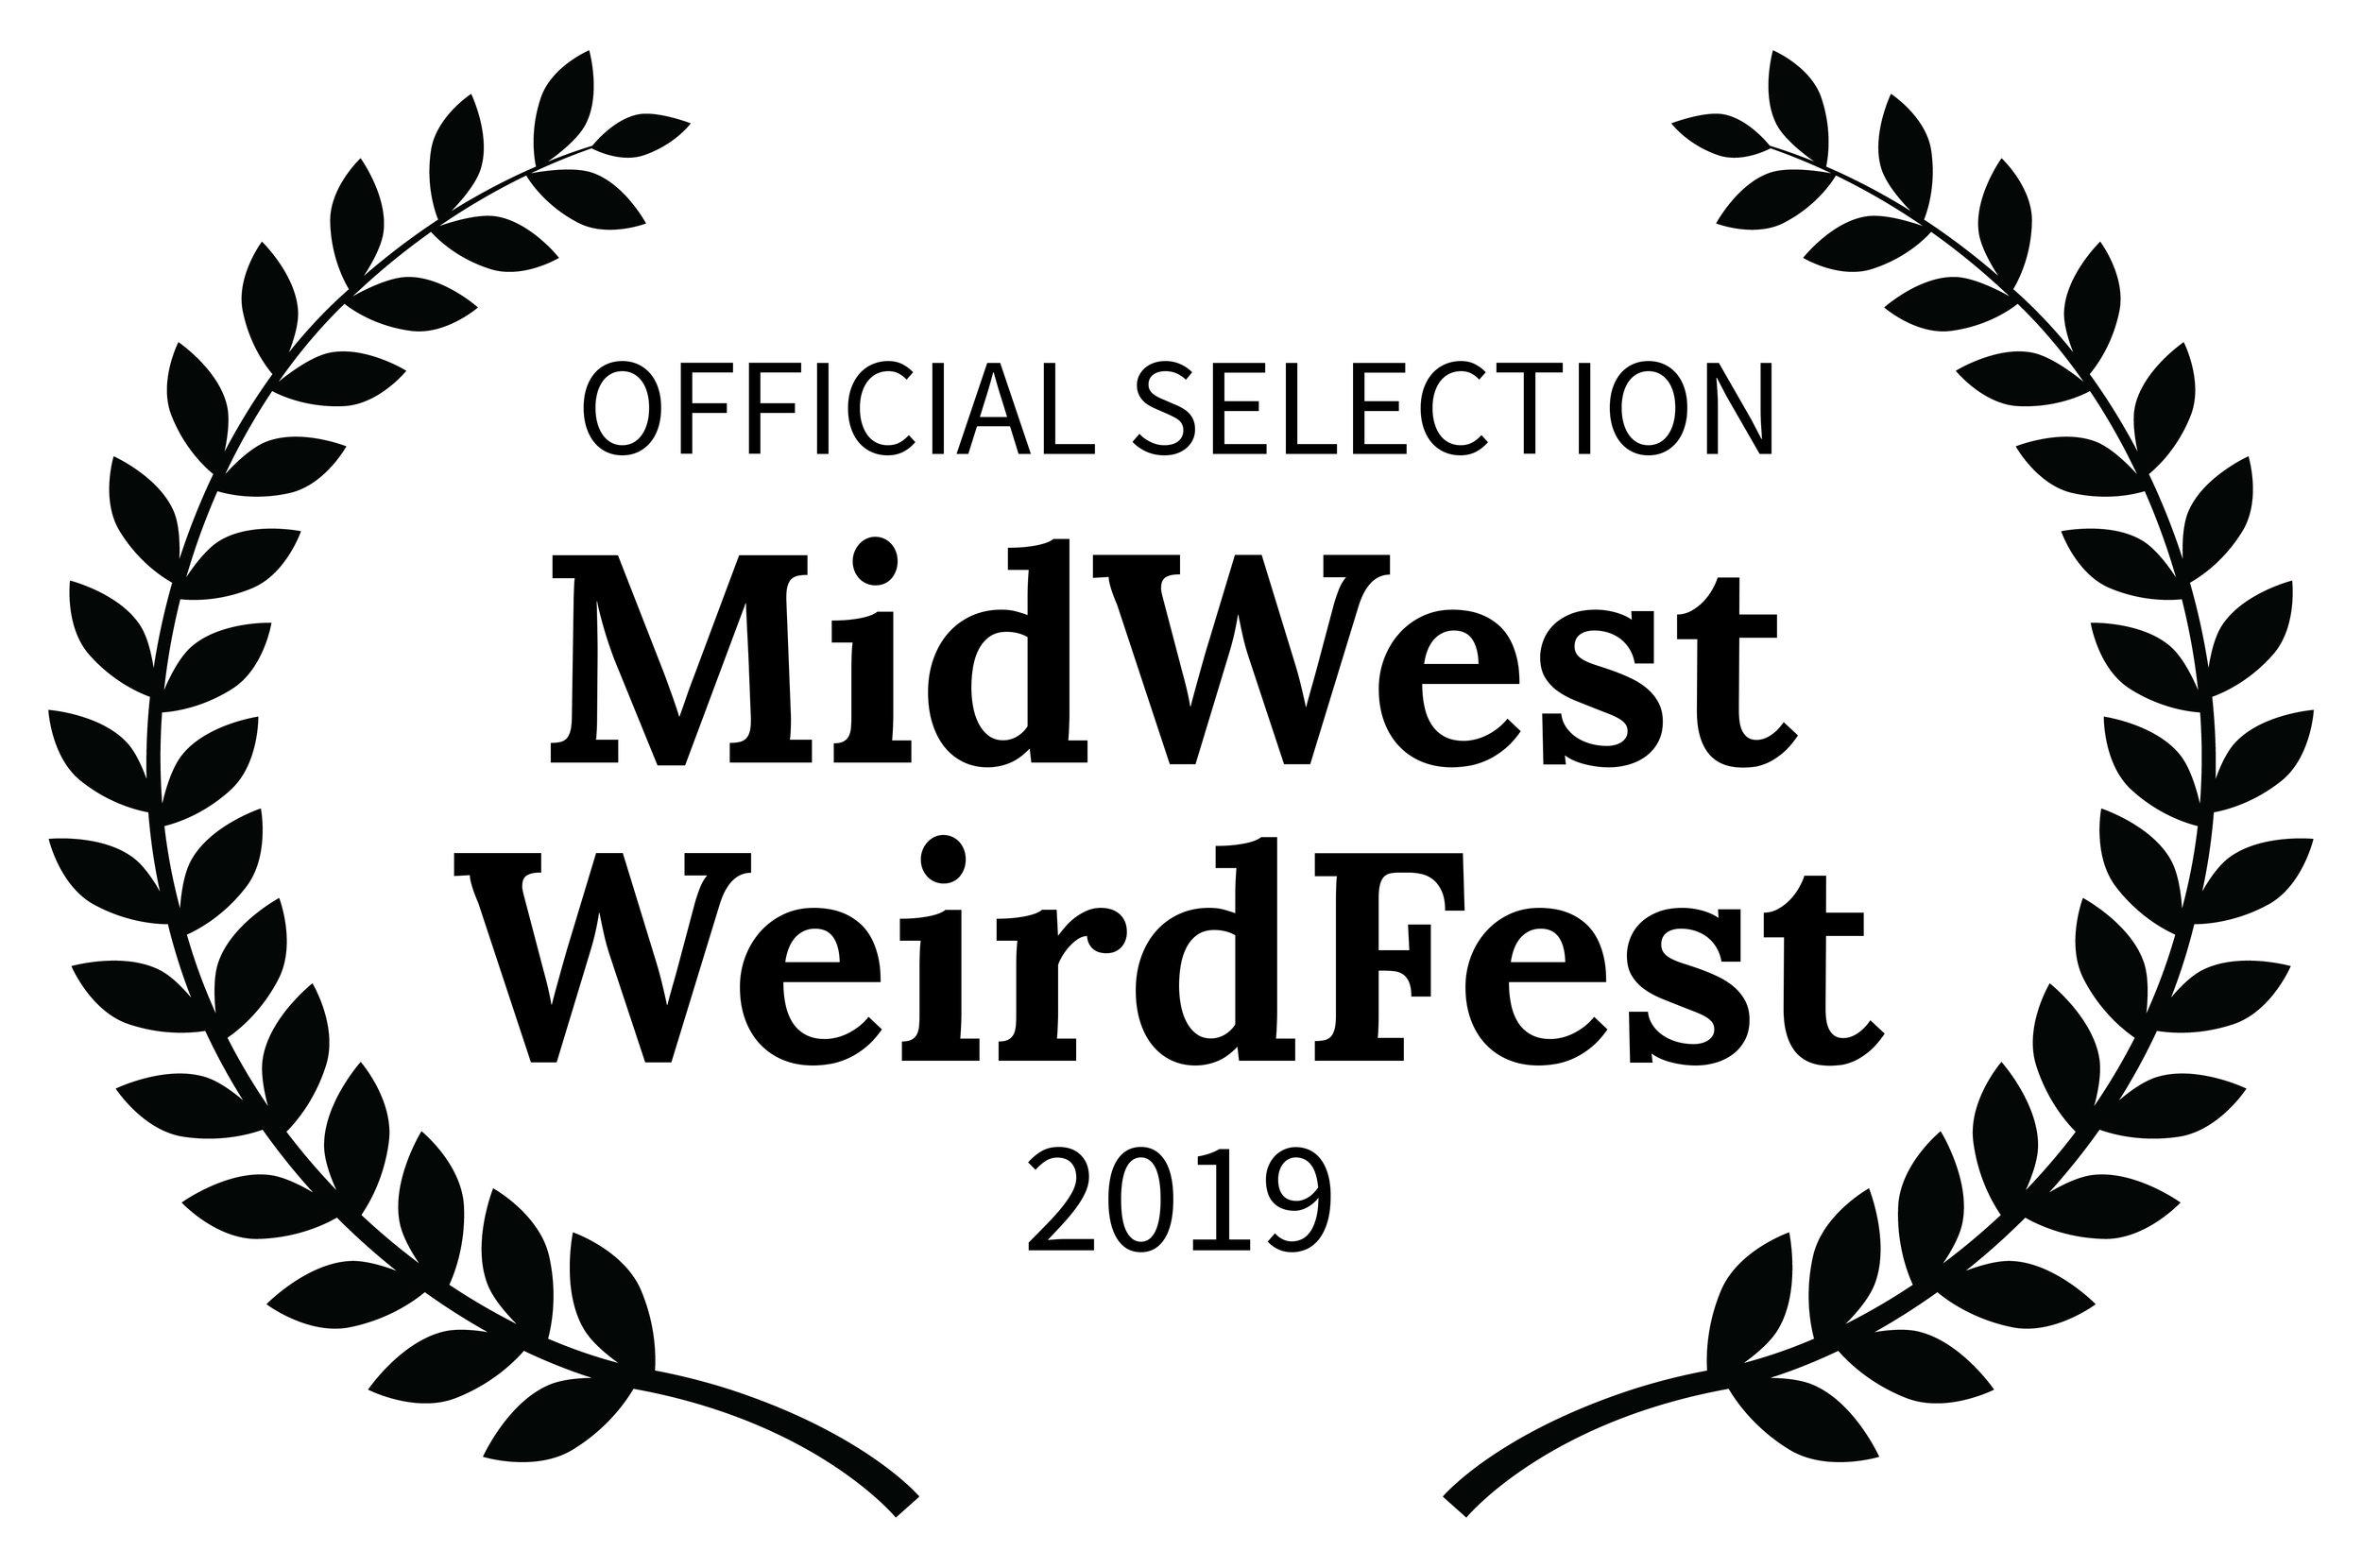 OFFICIALSELECTION-MidWestWeirdFest-2019_black.jpg